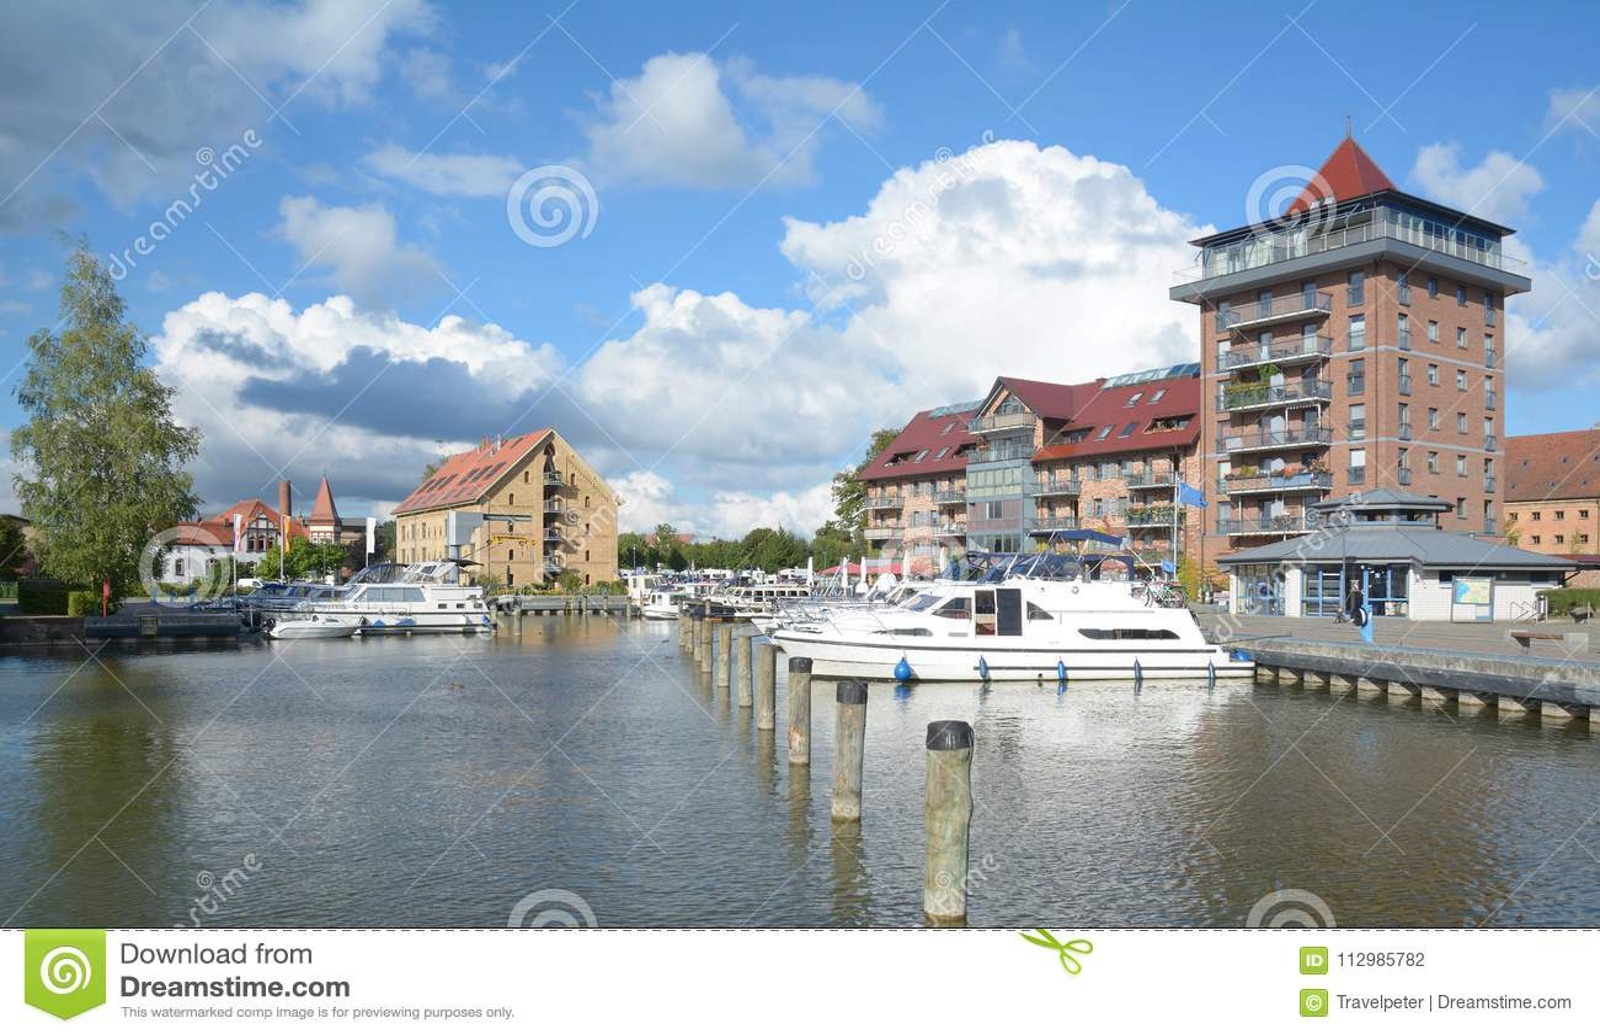 Neustrelitz,Mecklenburg Lake District,Germany